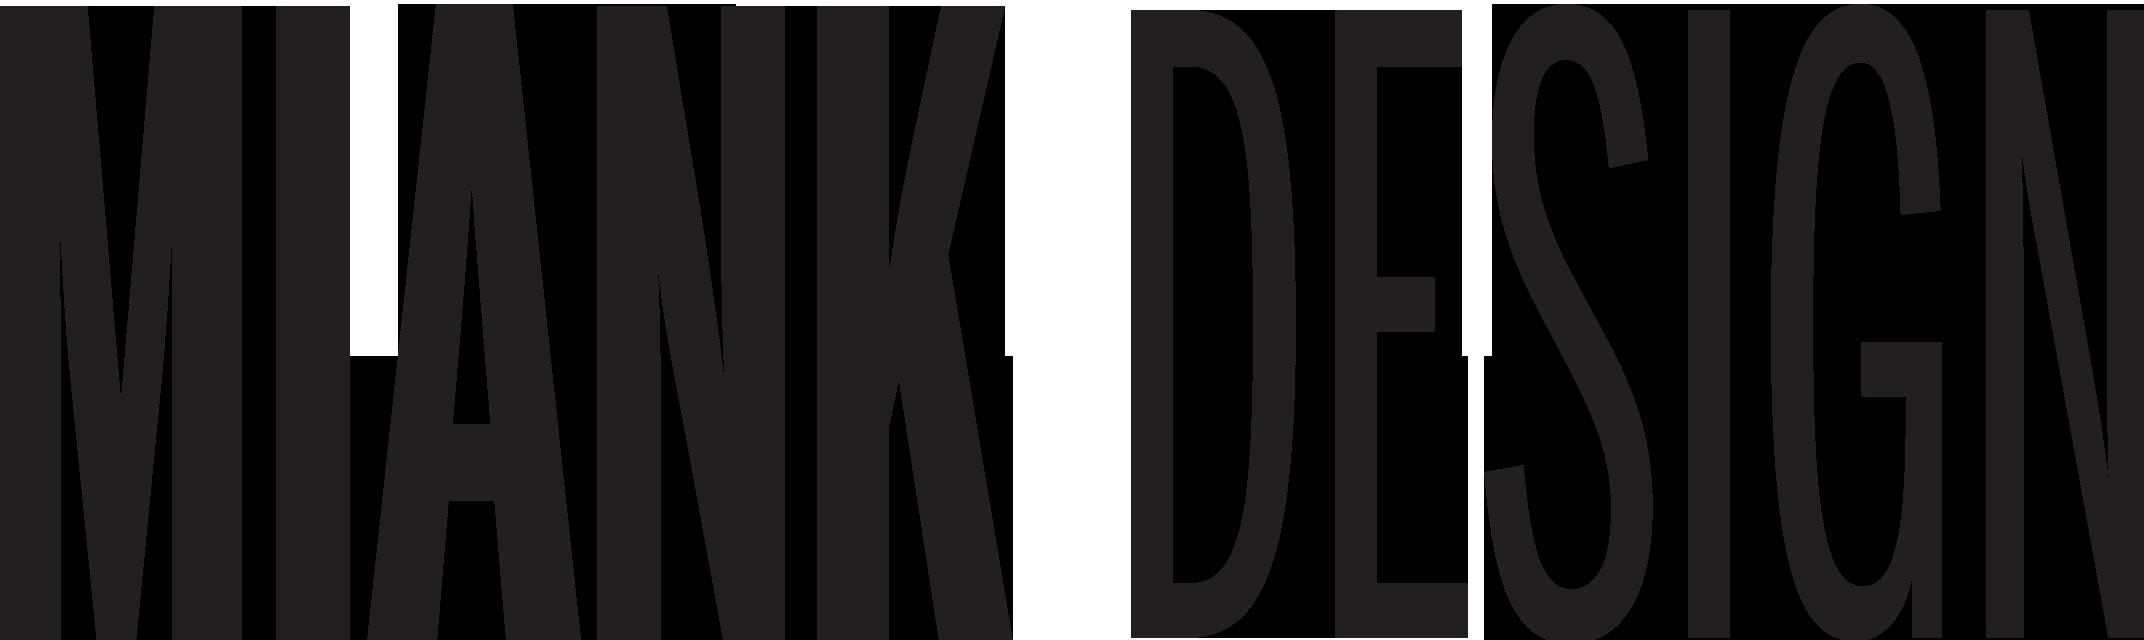 Miank Design